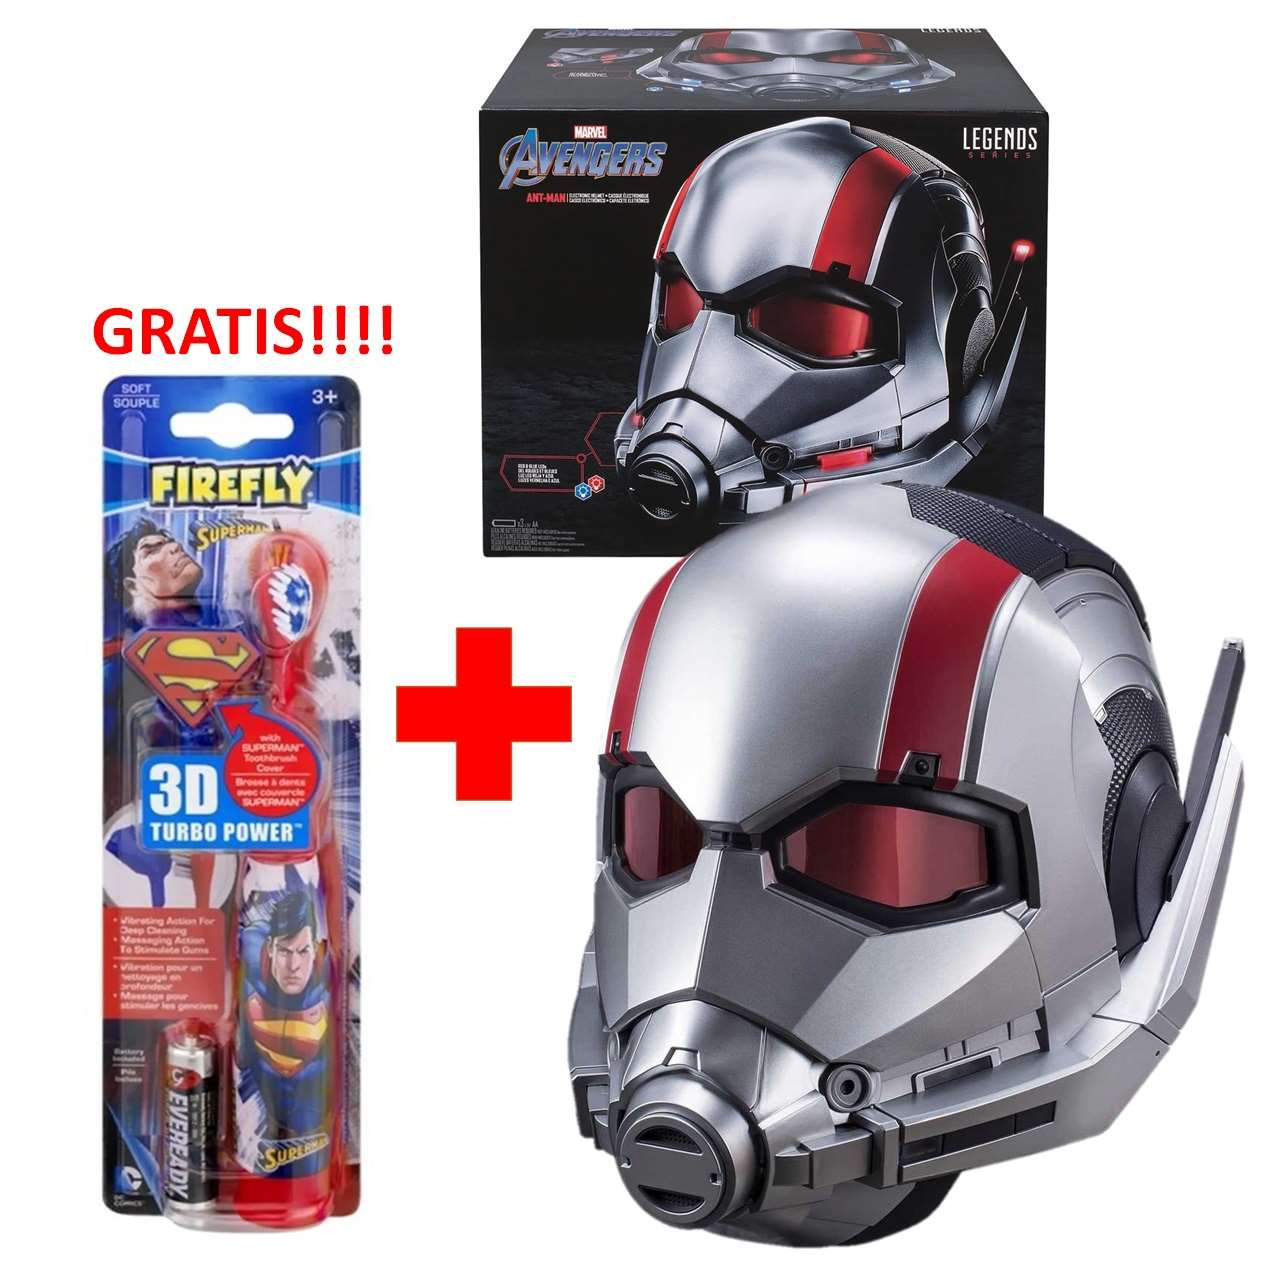 Casco Electrónico Ant Man Marvel Legends Series + Cepillo Gratis!!